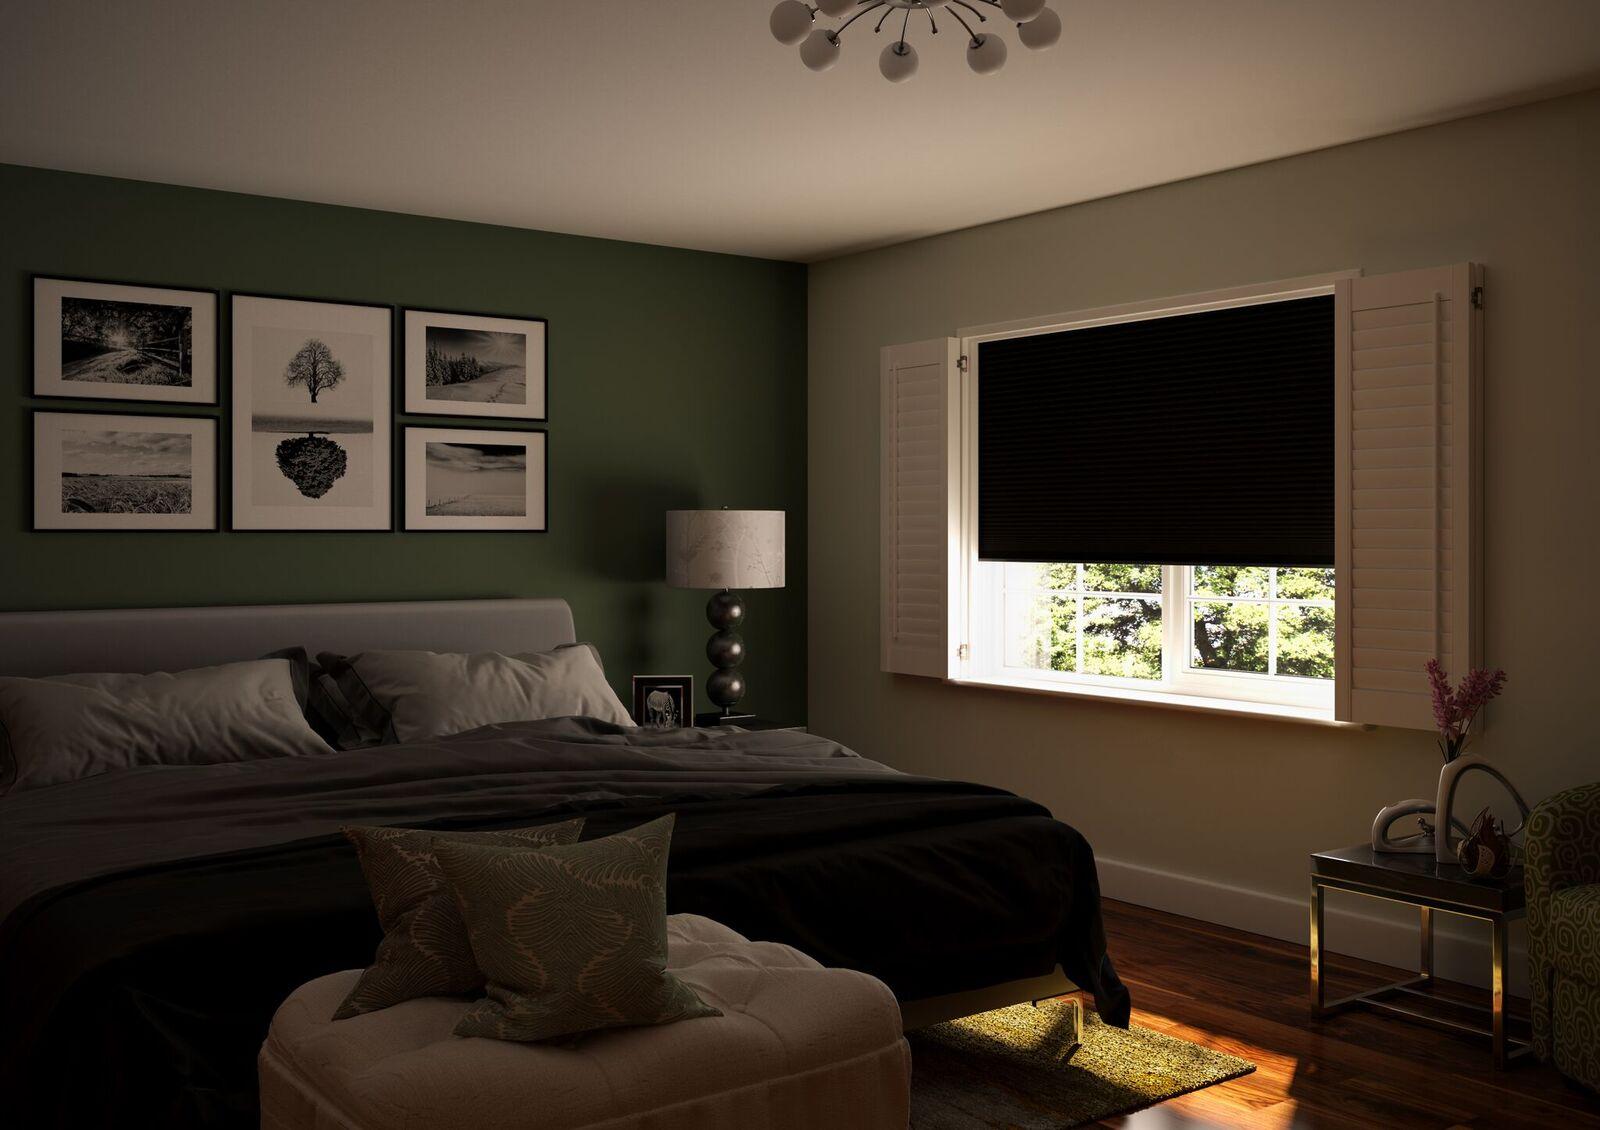 ShutterShade Bedroom Dark preview